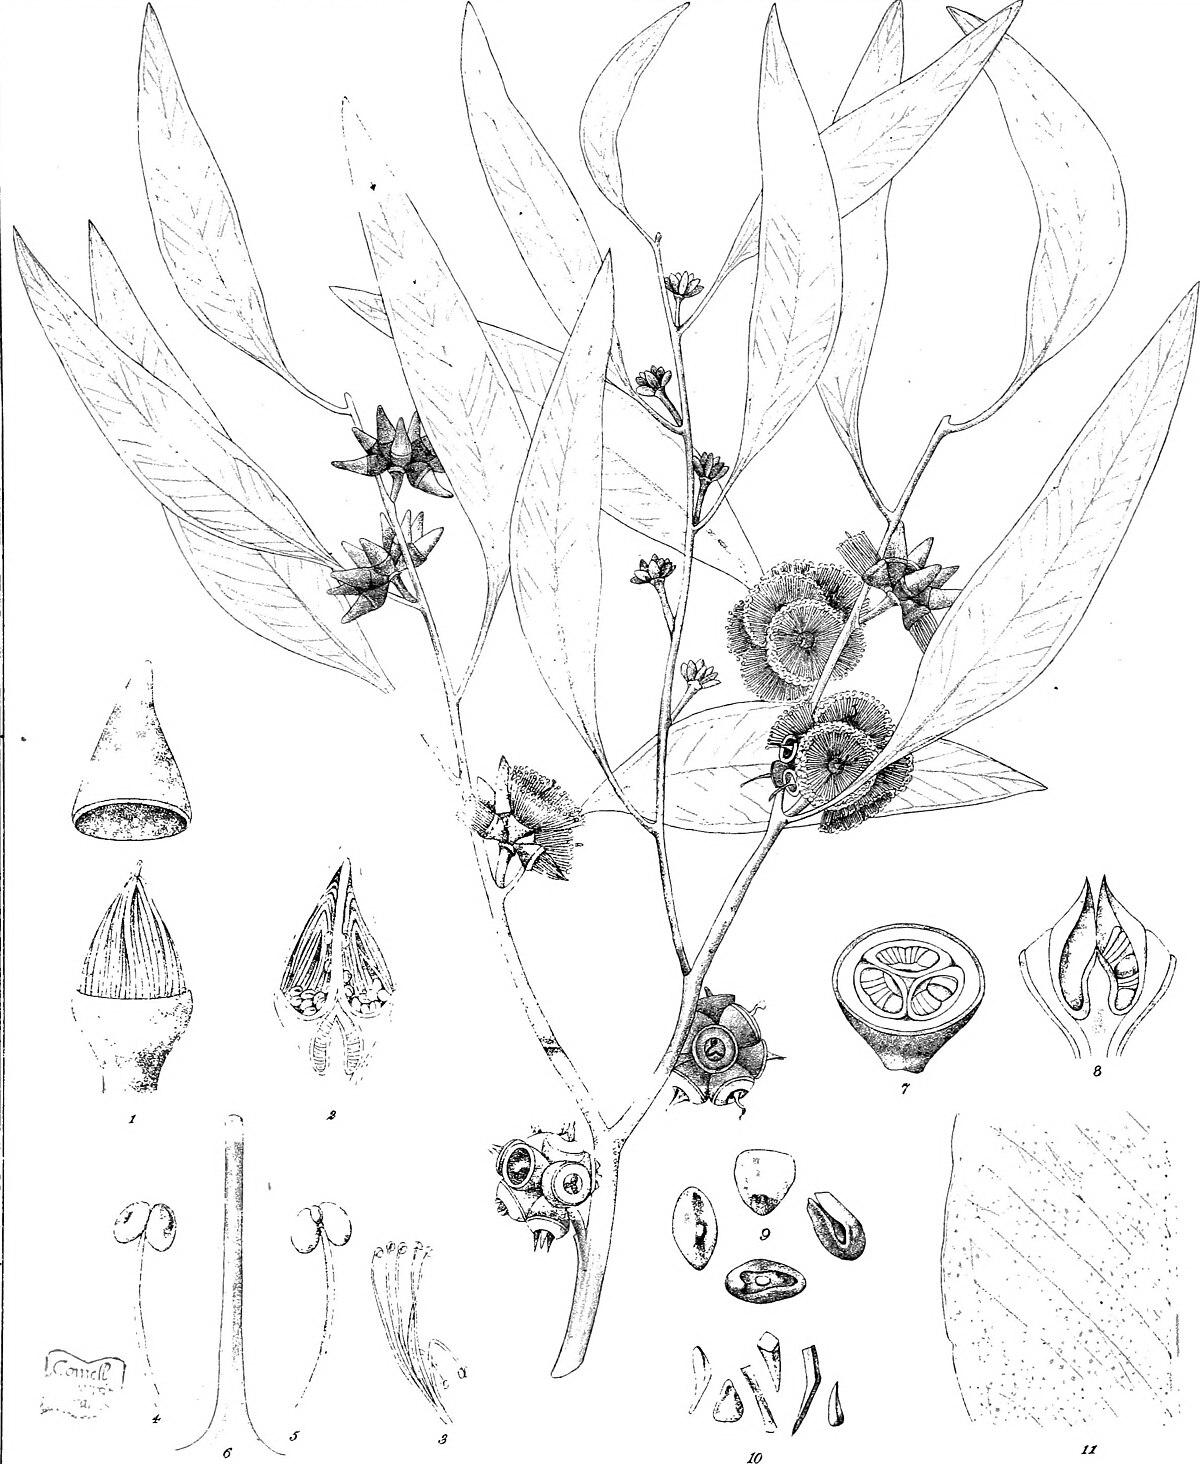 Line Art Wikipedia : Eucalyptus decipiens wikipedia